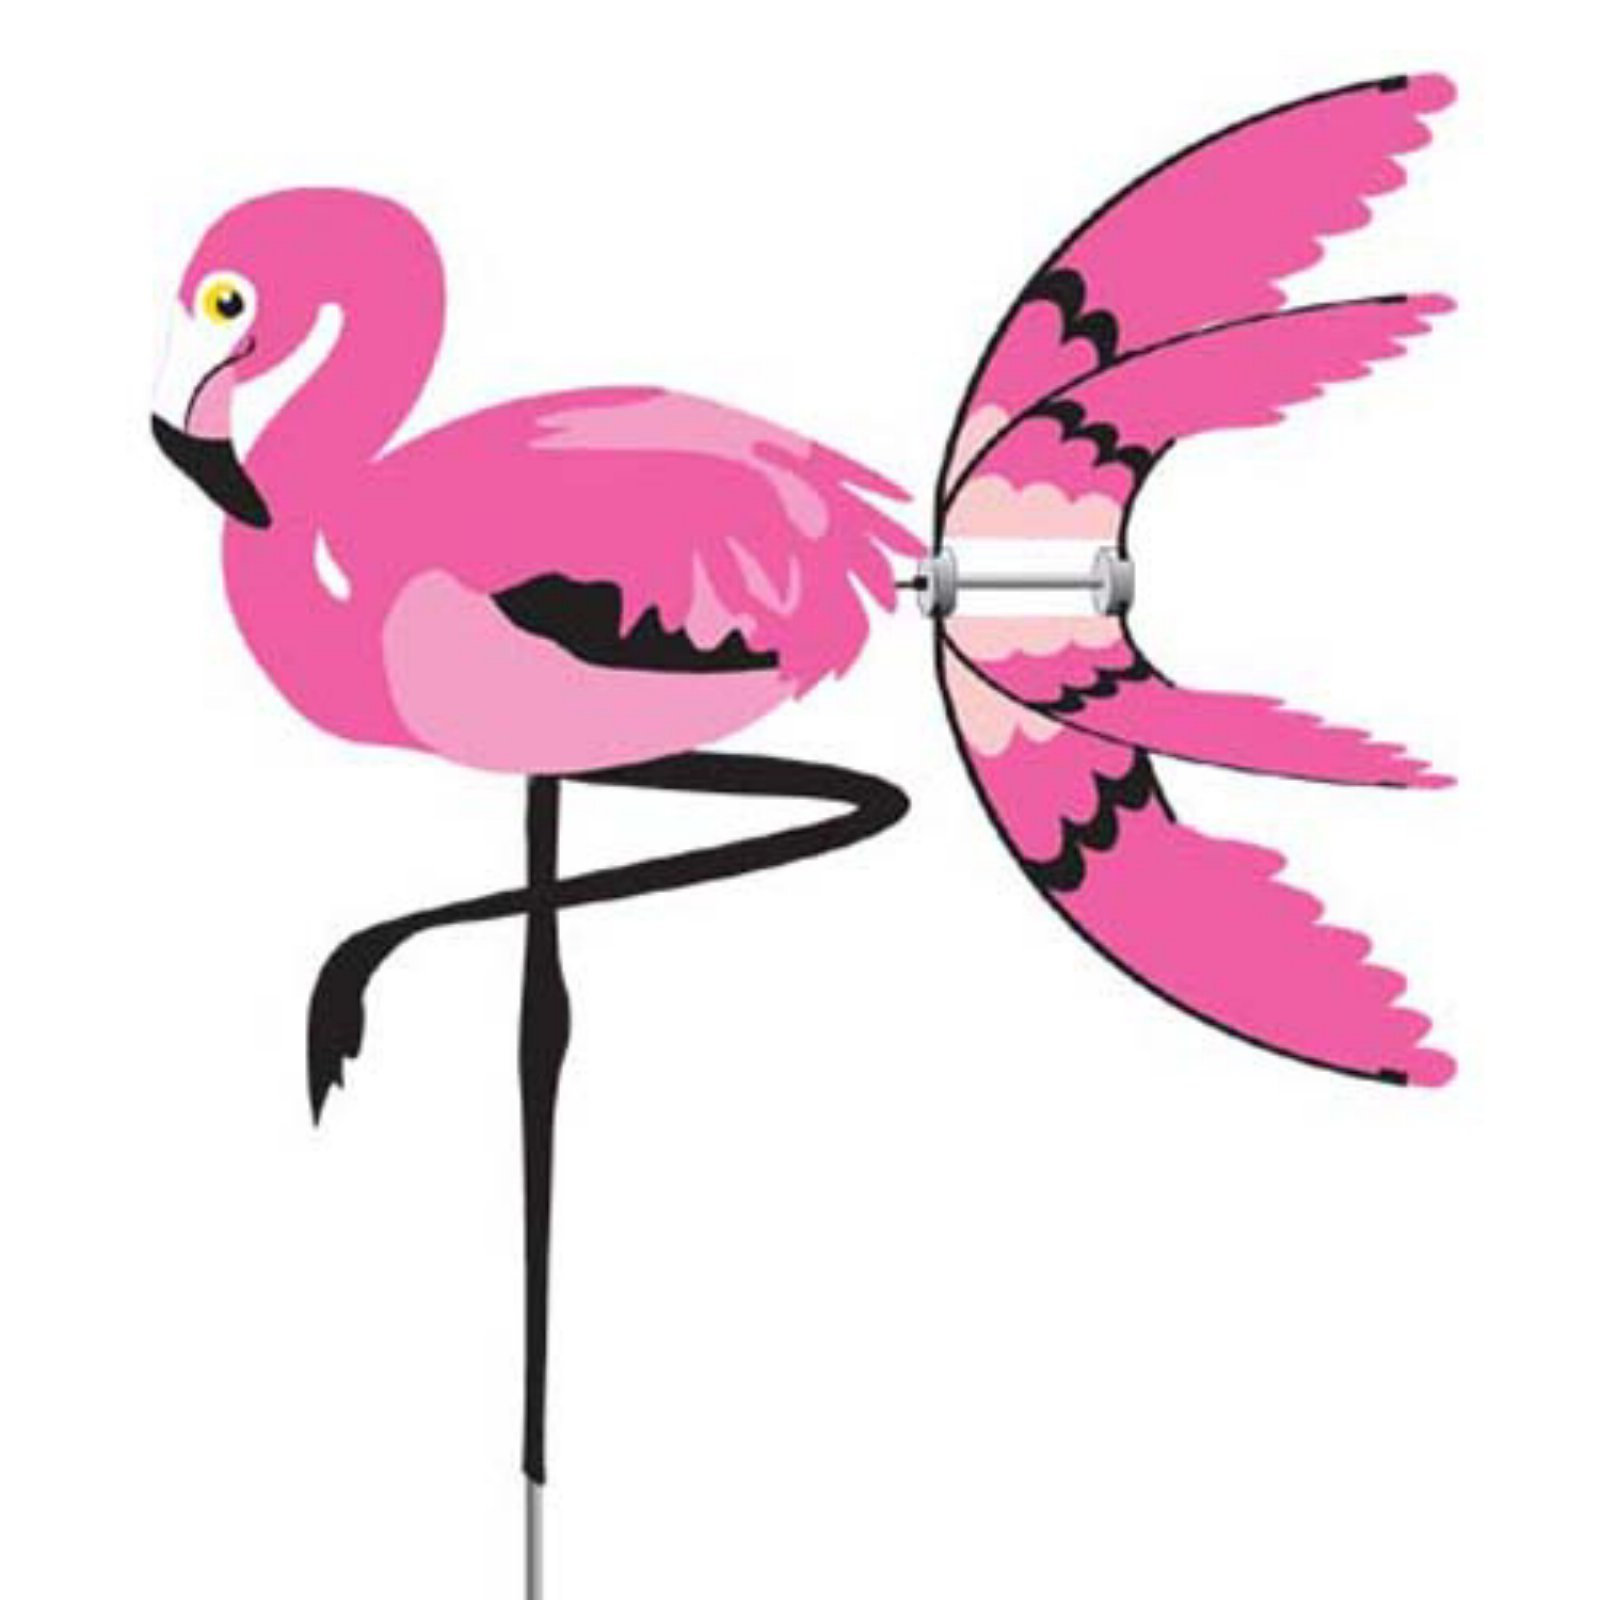 Premier Designs Flamingo Garden Spinner